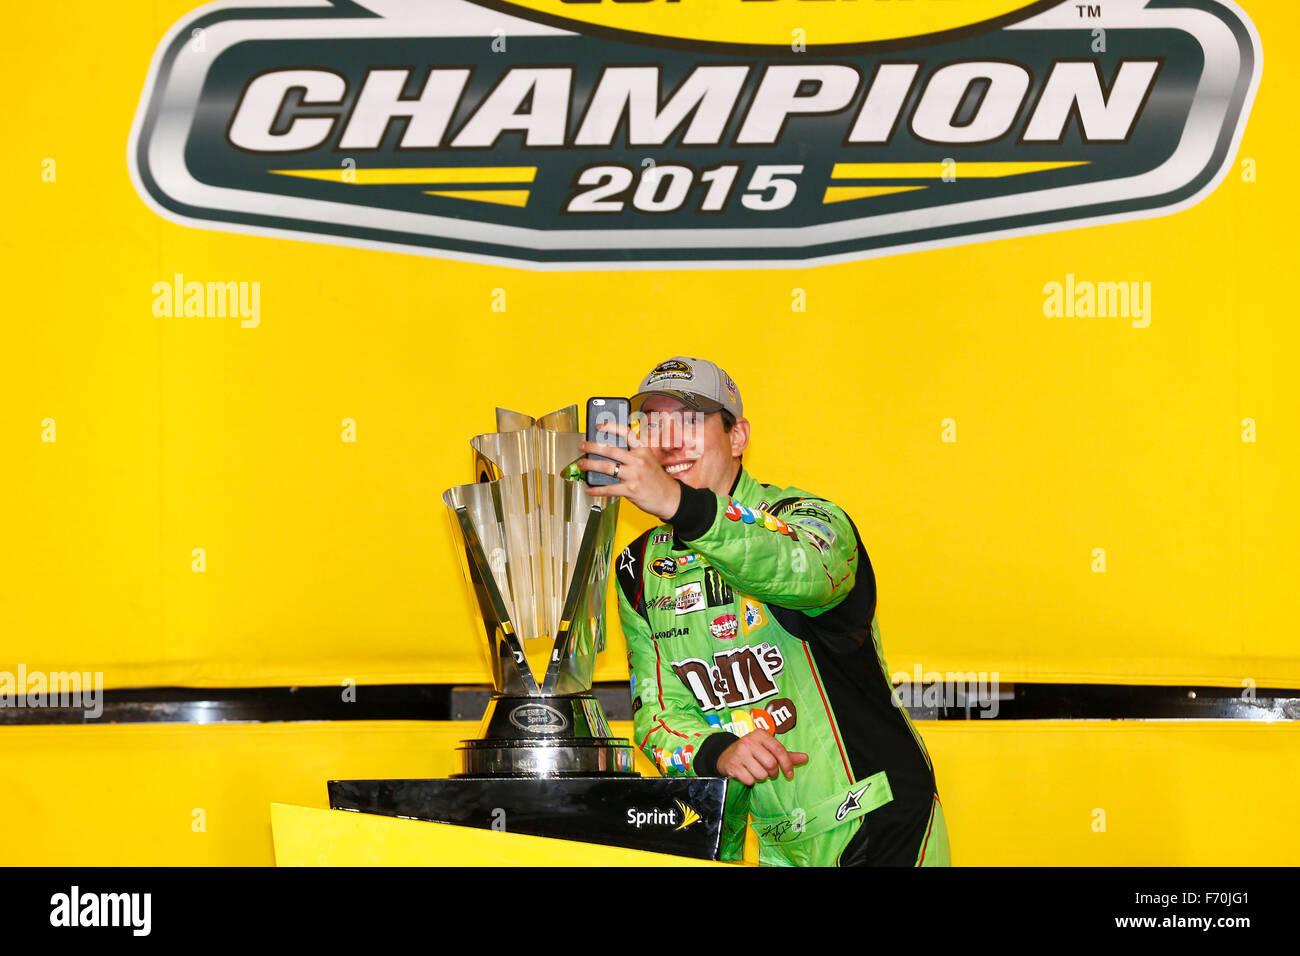 Homestead, Floride, USA. 23 Nov, 2015. Homestead, Floride - Nov 23, 2015: Kyle Busch (18) remporte le championnat Photo Stock